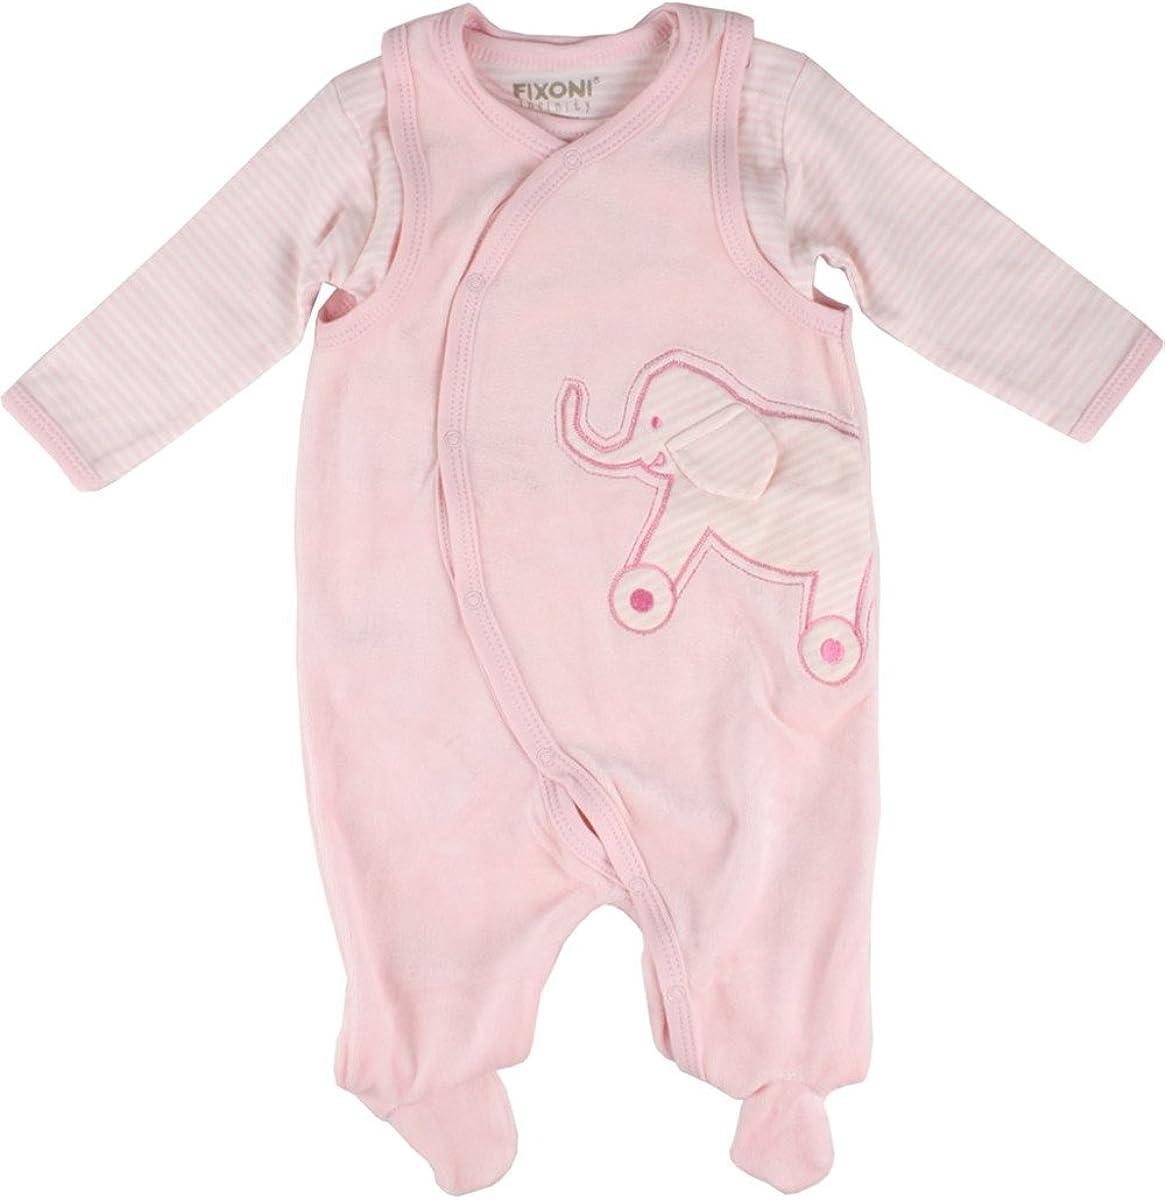 rosa mit Elefant Body Fixoni Baby M/ädchen Strampler